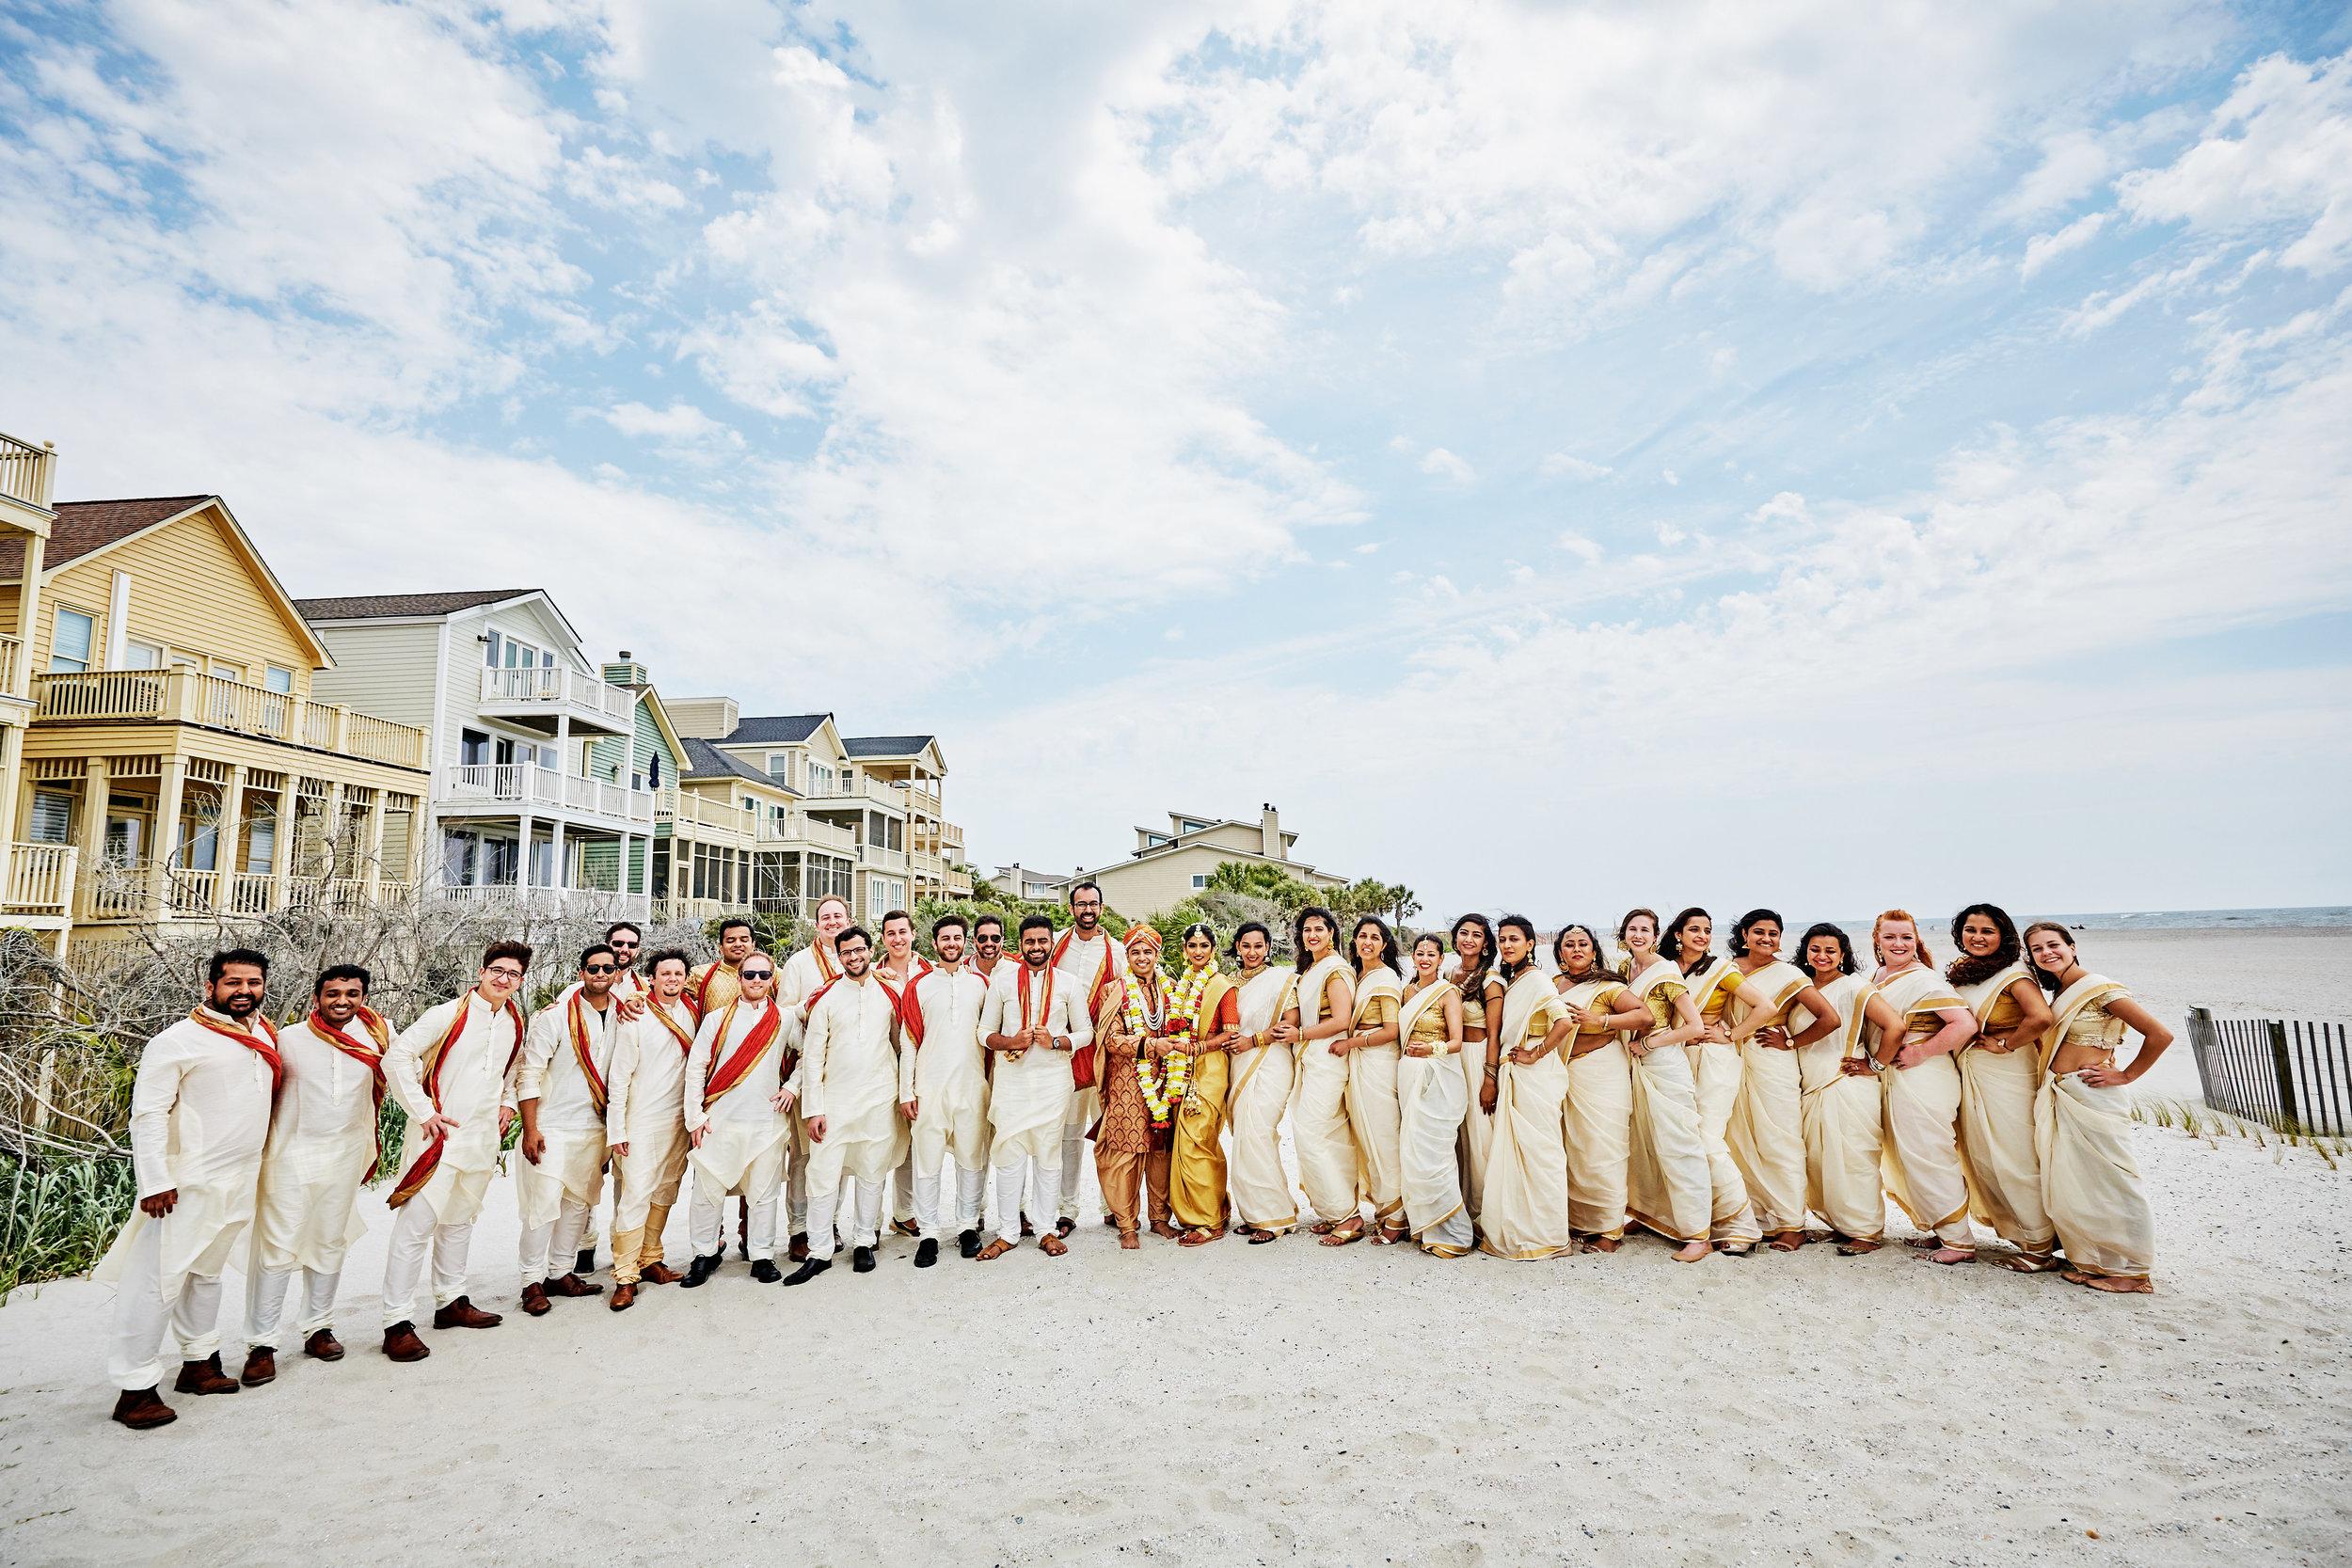 Wild Dunes Wedding Photos by Vitor Lindo _ 470.jpg